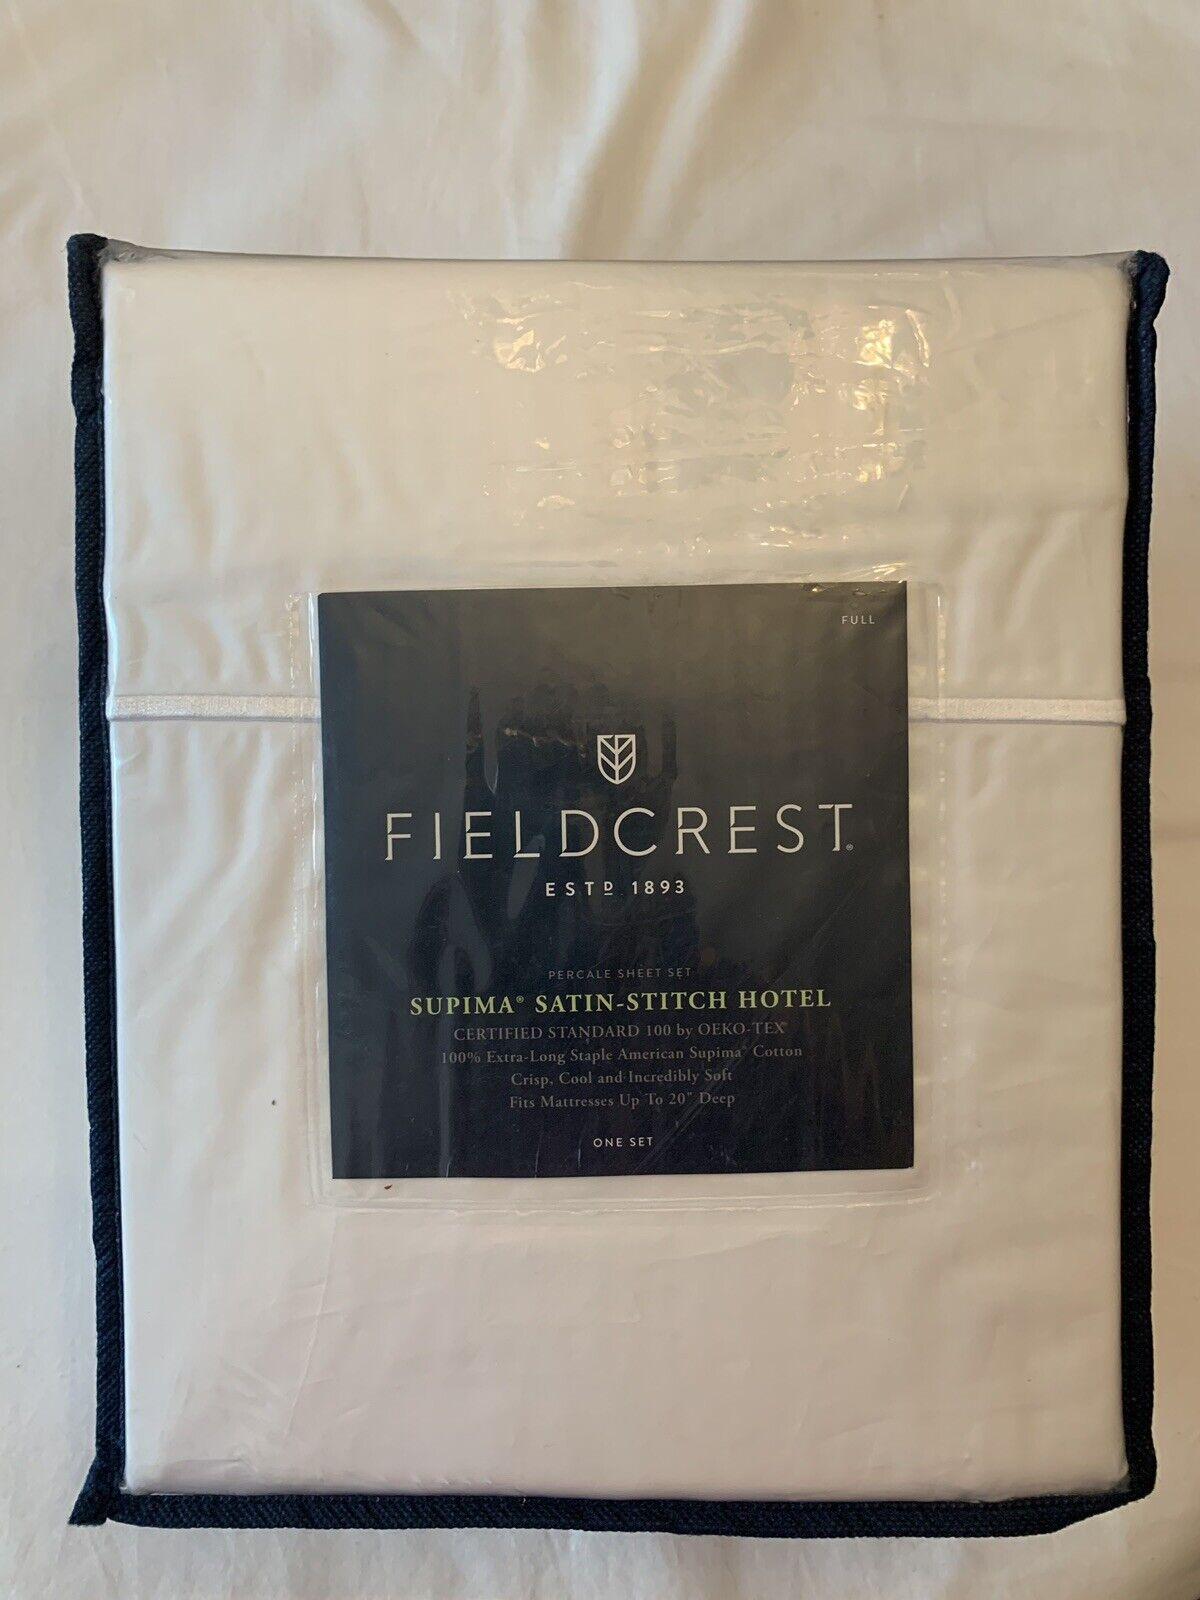 Suprima Satin Stitch Hotel Sheet Set, 300 TC-Fieldcrest-Complet, Blanc-Neuf